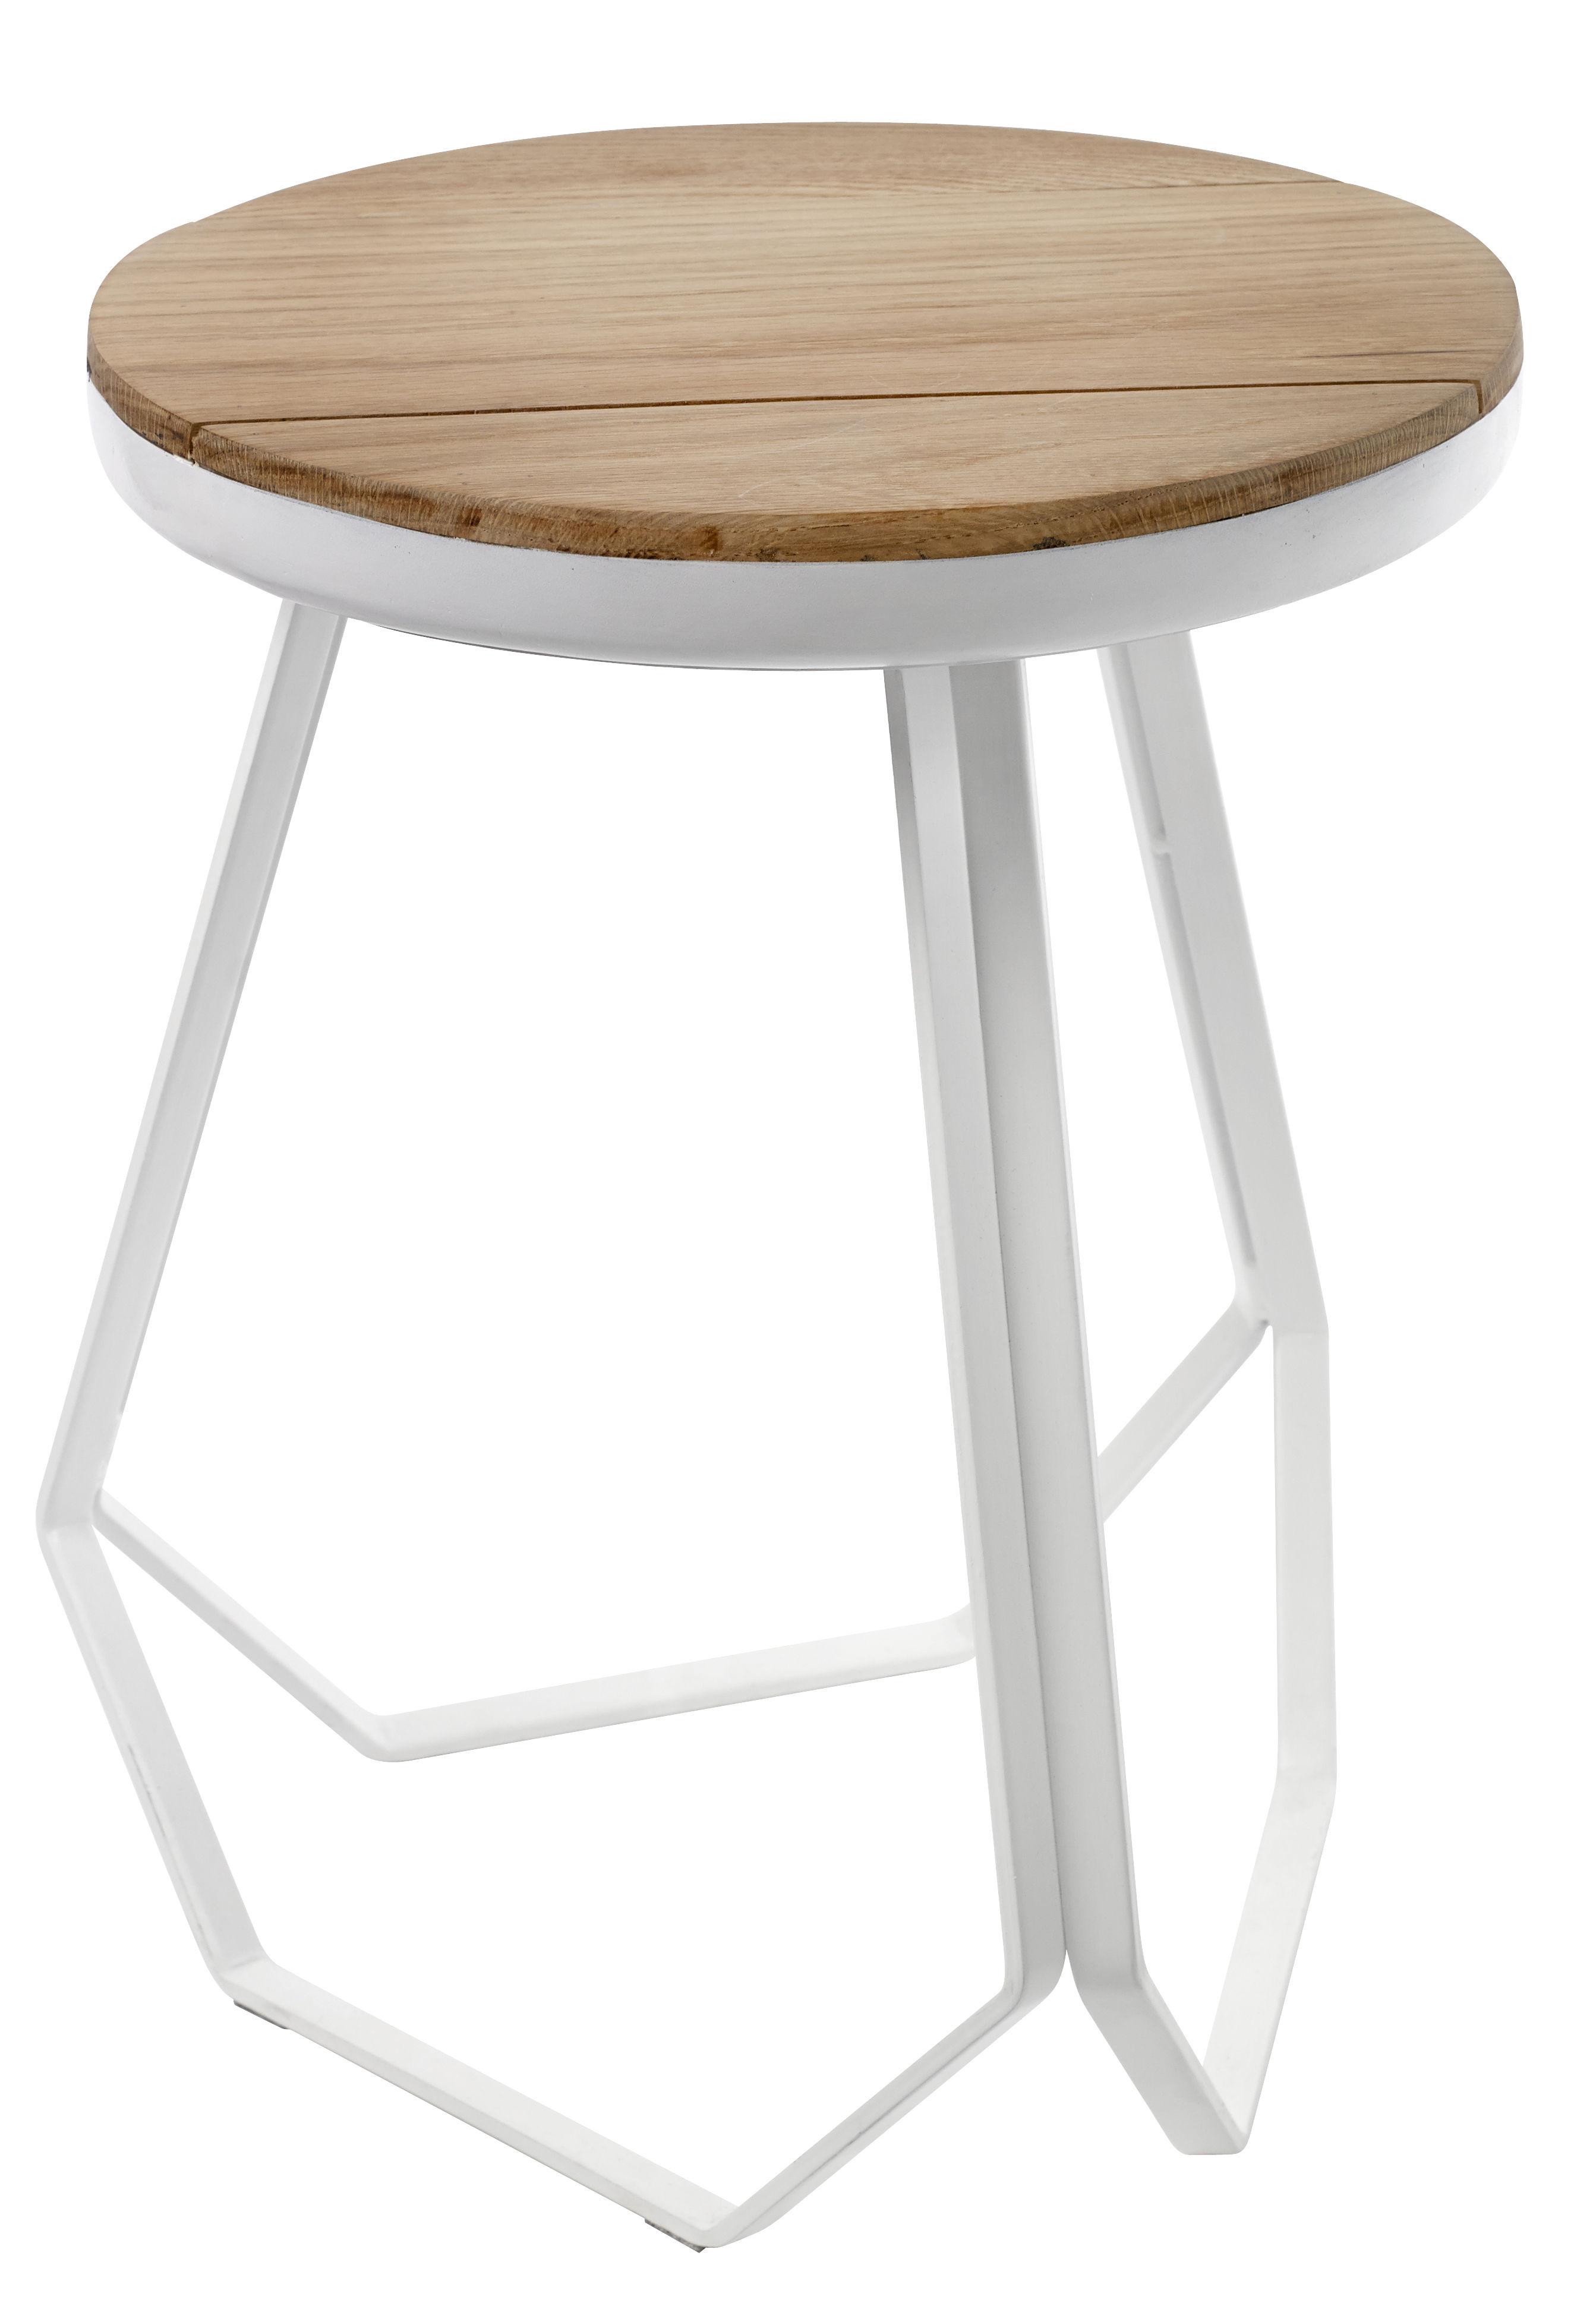 daysign h 45 cm holz metall serax hocker. Black Bedroom Furniture Sets. Home Design Ideas